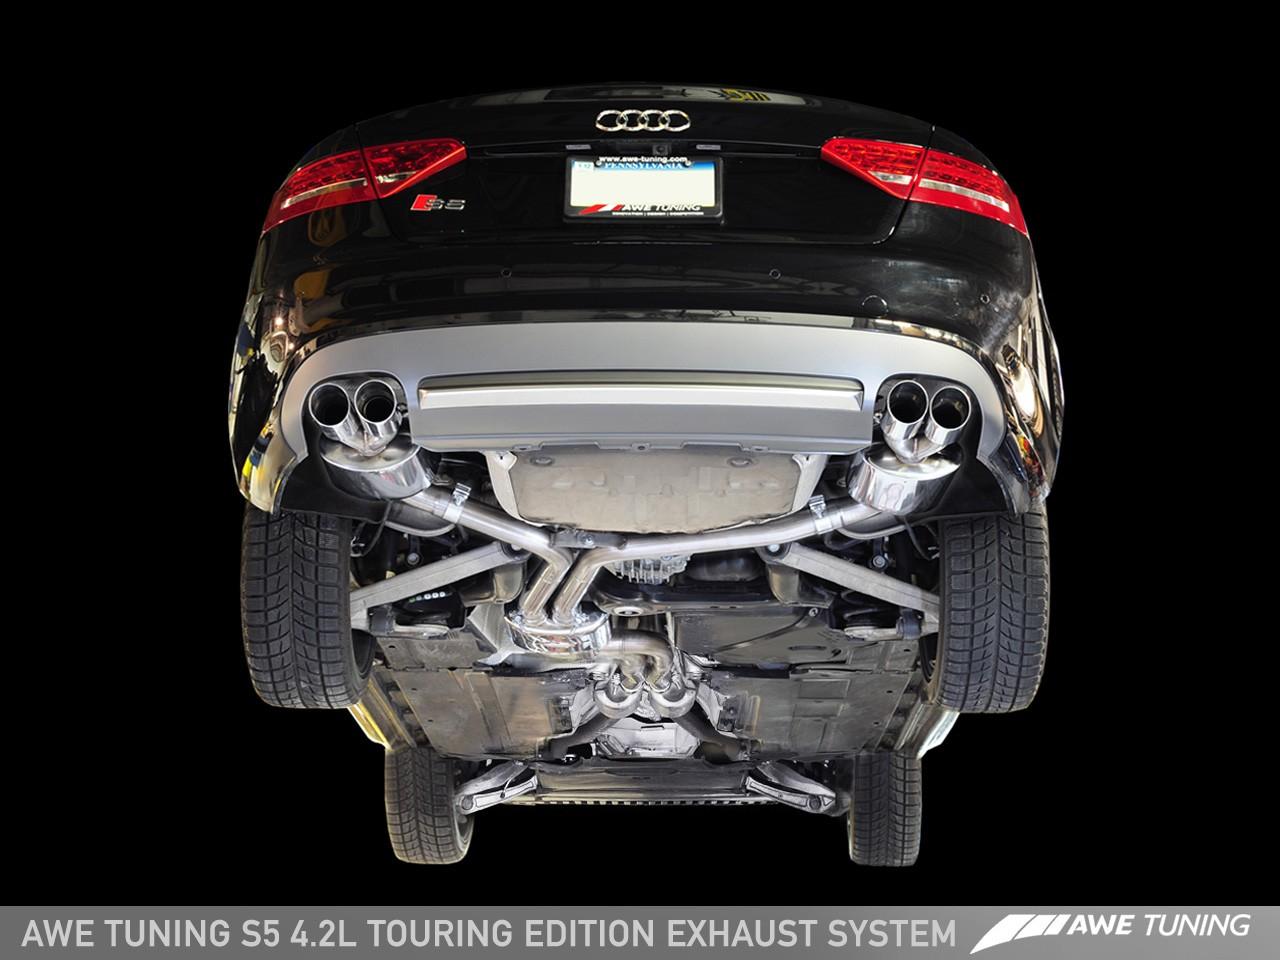 Audi S5 Engine Diagram - A Wiring Diagram For 2005 Hyundai Santa Fe -  maxoncb.yenpancane.jeanjaures37.fr   2015 Audi S5 Engine Diagram      Wiring Diagram Resource